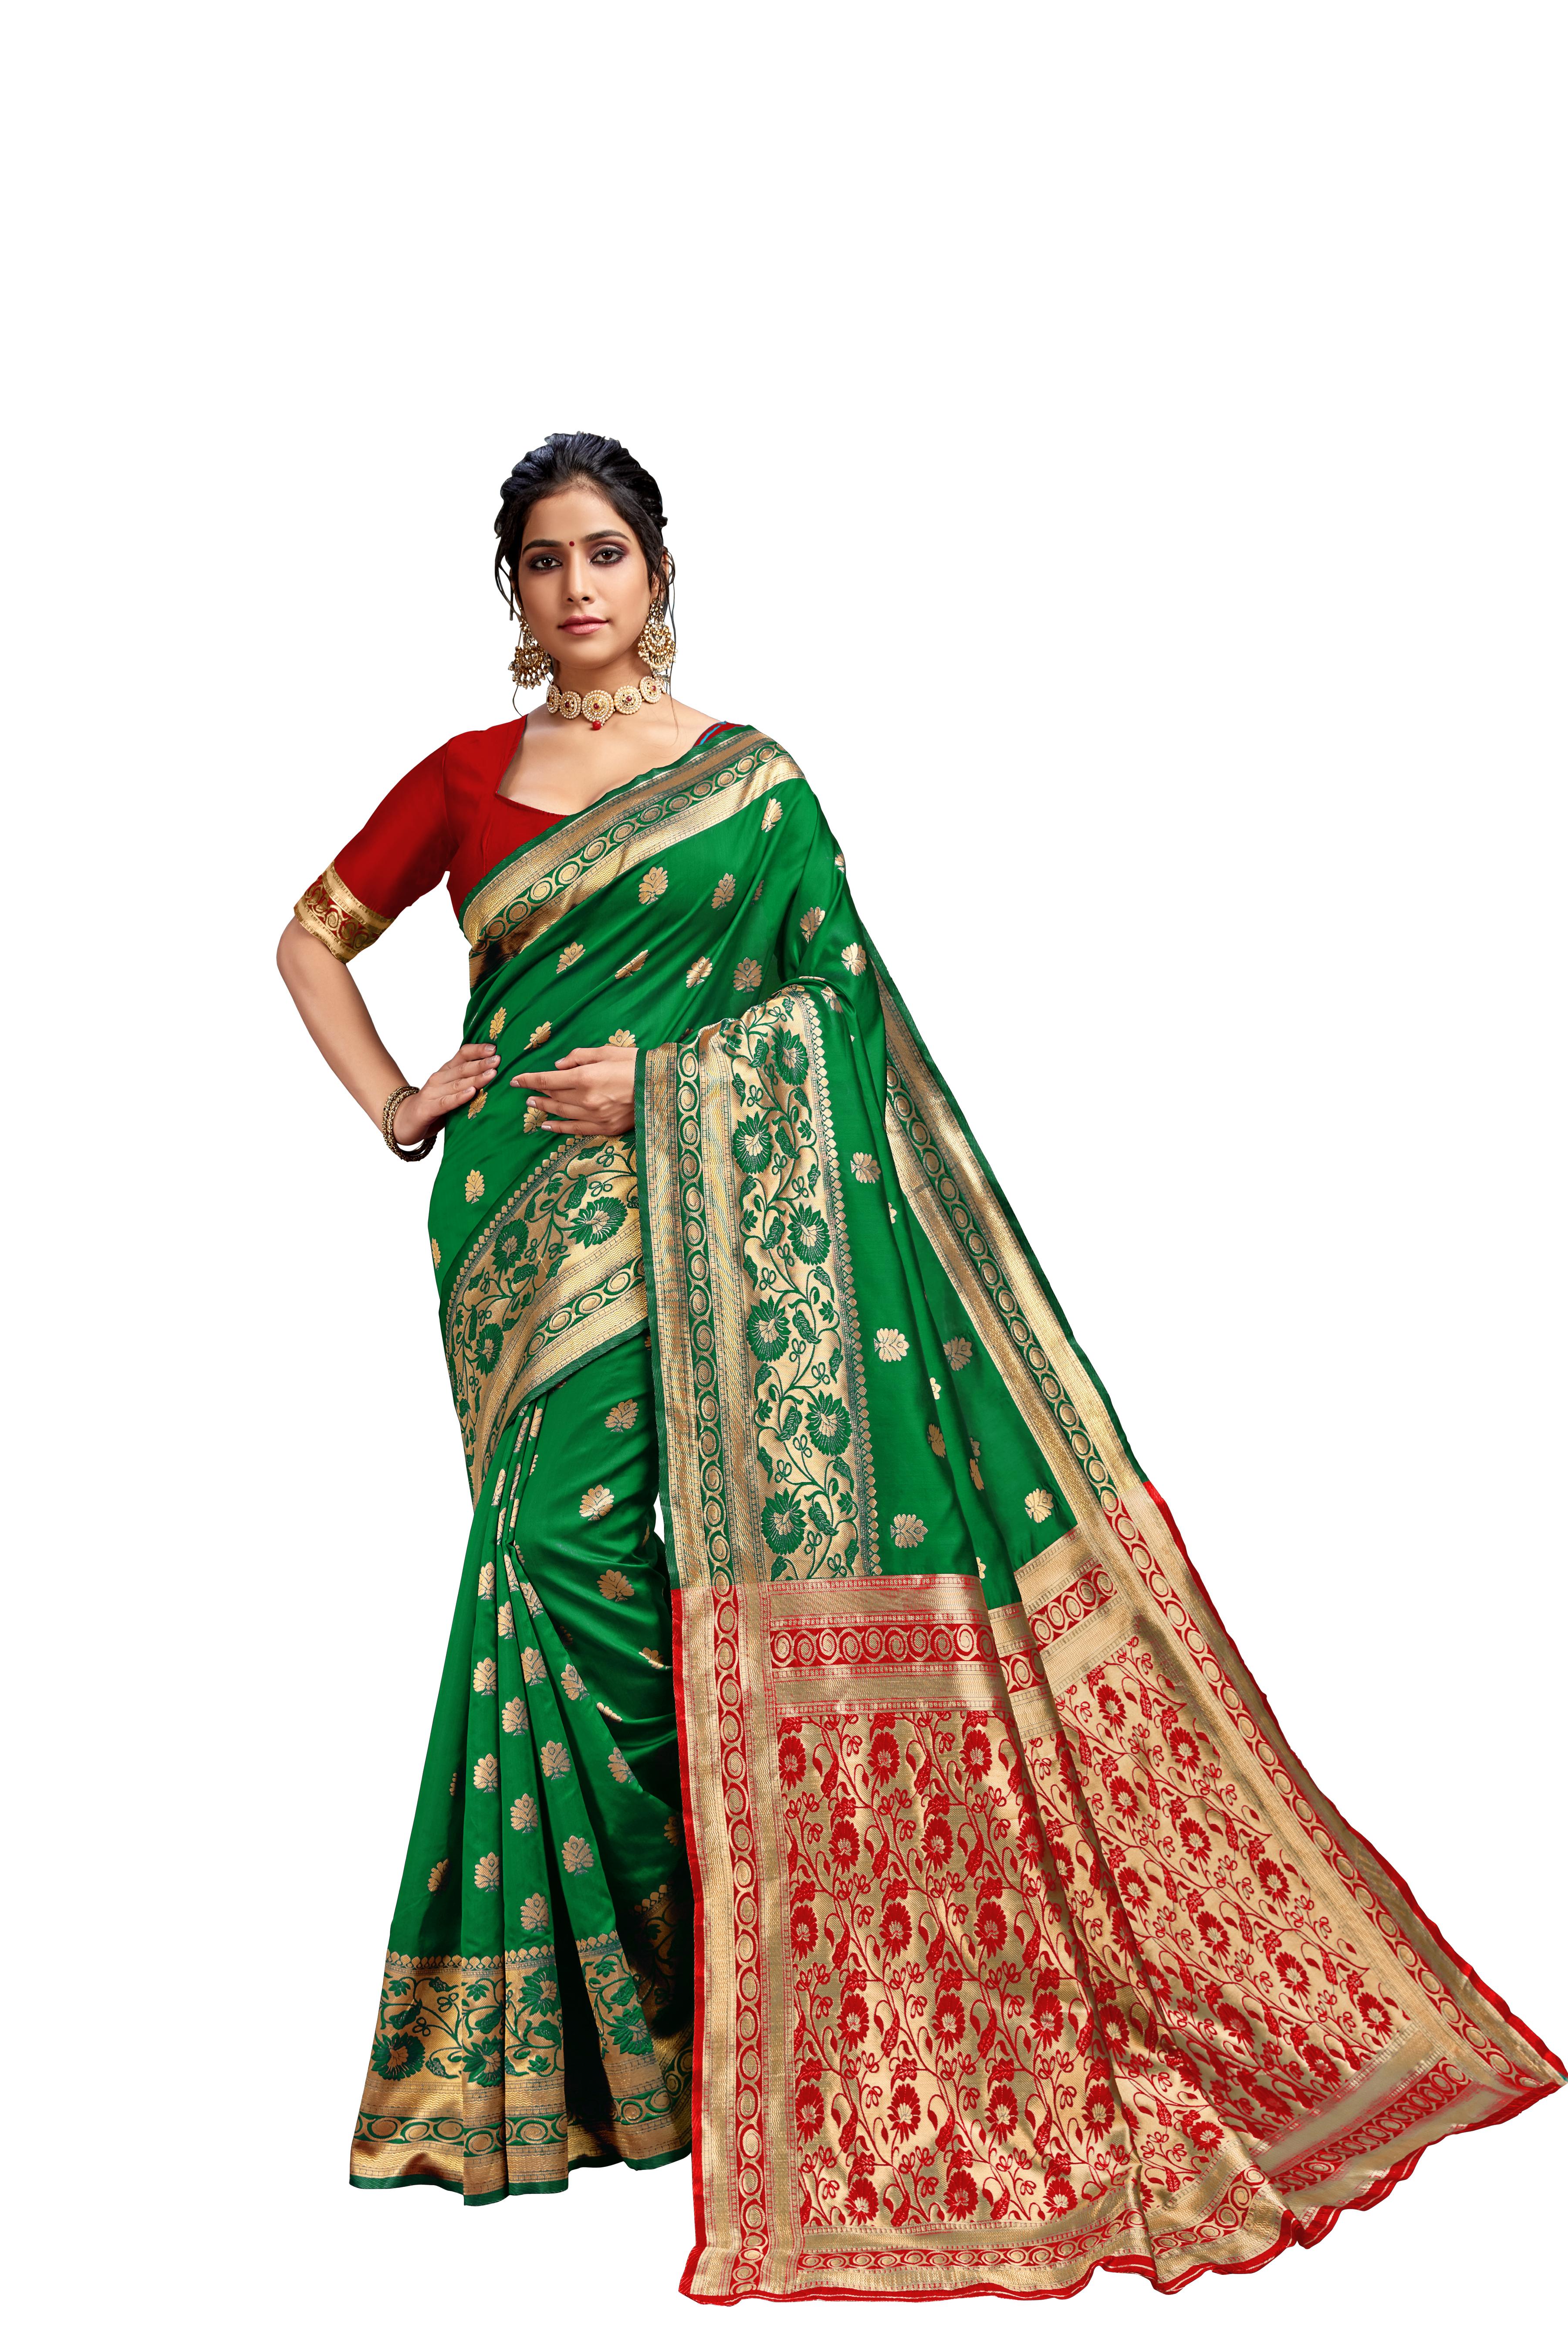 Glemora Green & Red Lichi Cotton Kalpana Saree With Unstitched Blouse